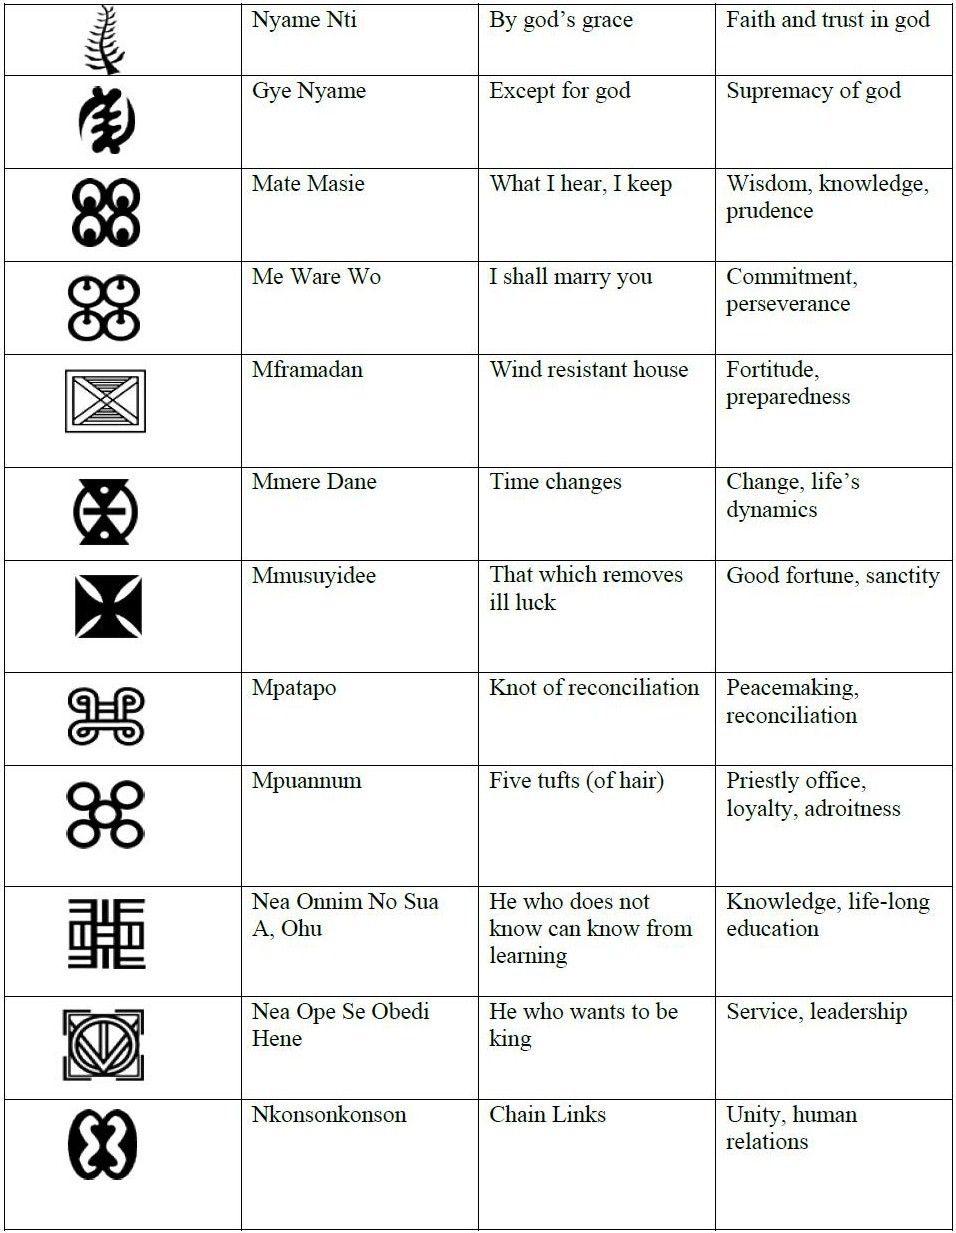 Adinkra symbols chart 3 tattoos pinterest adinkra symbols adinkra symbols chart 3 biocorpaavc Choice Image